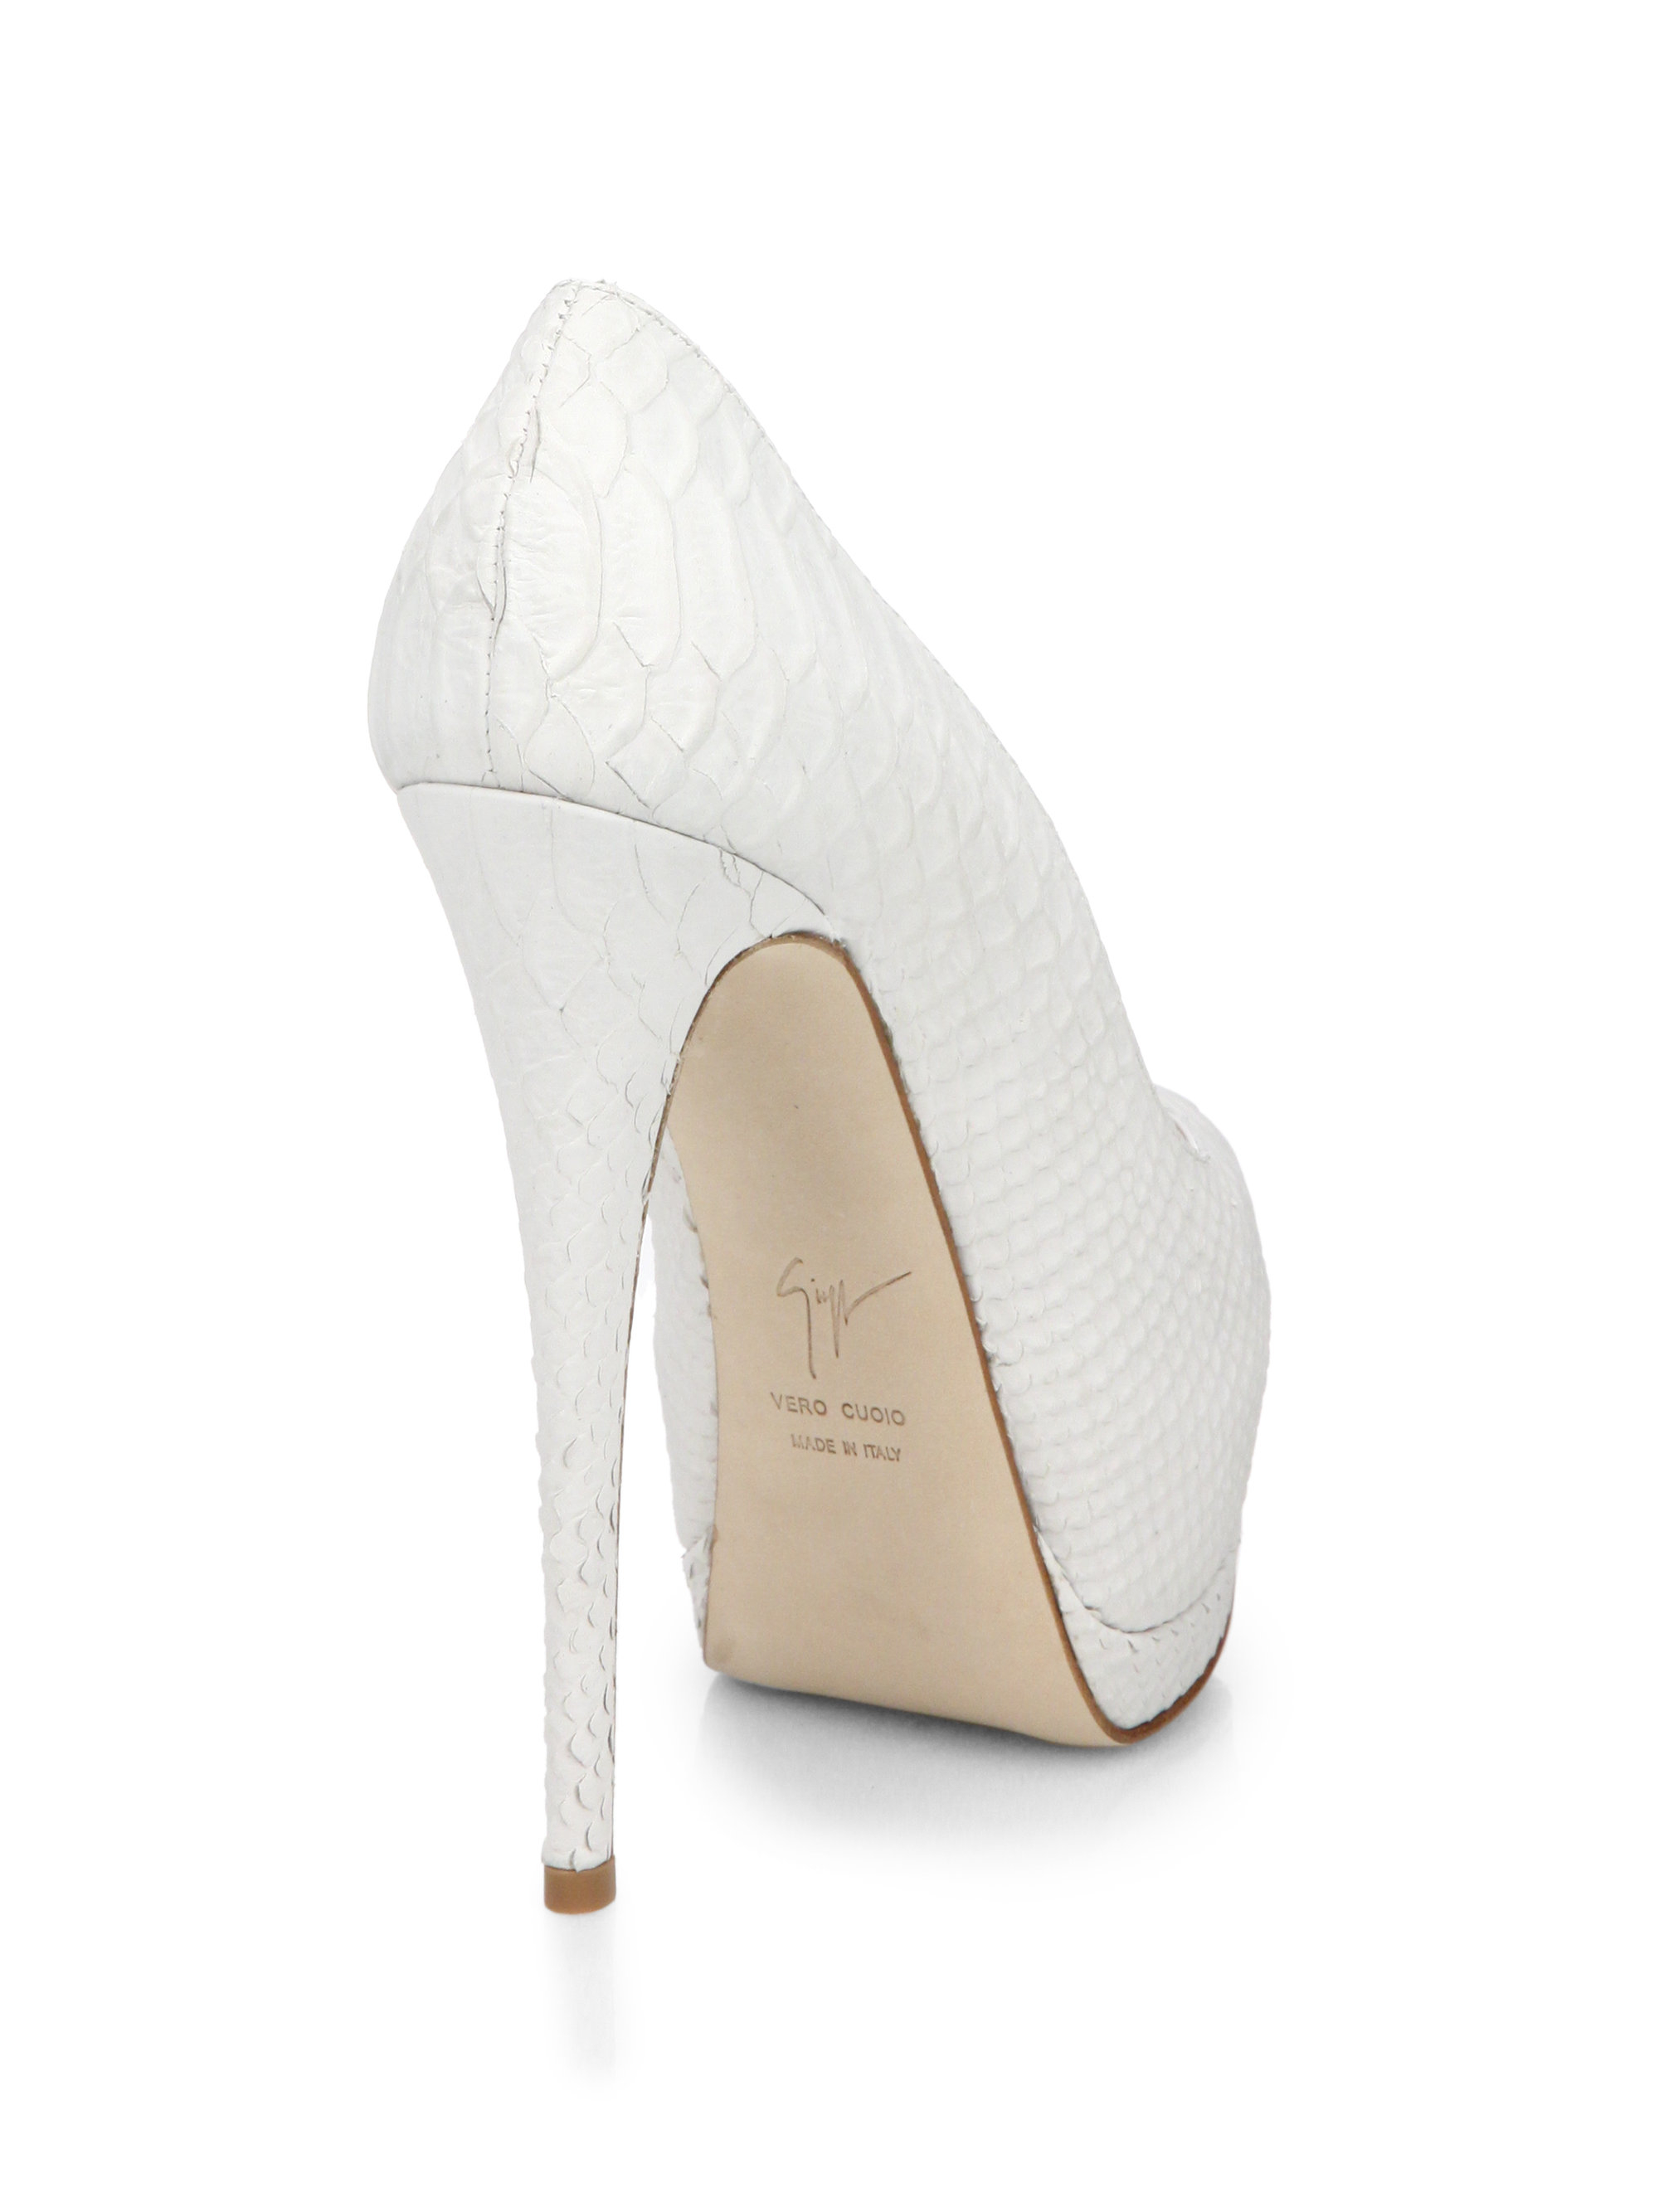 5we1rPT Giuseppe Zanotti Women Peep Hole Boots White Leather 130Mm UK